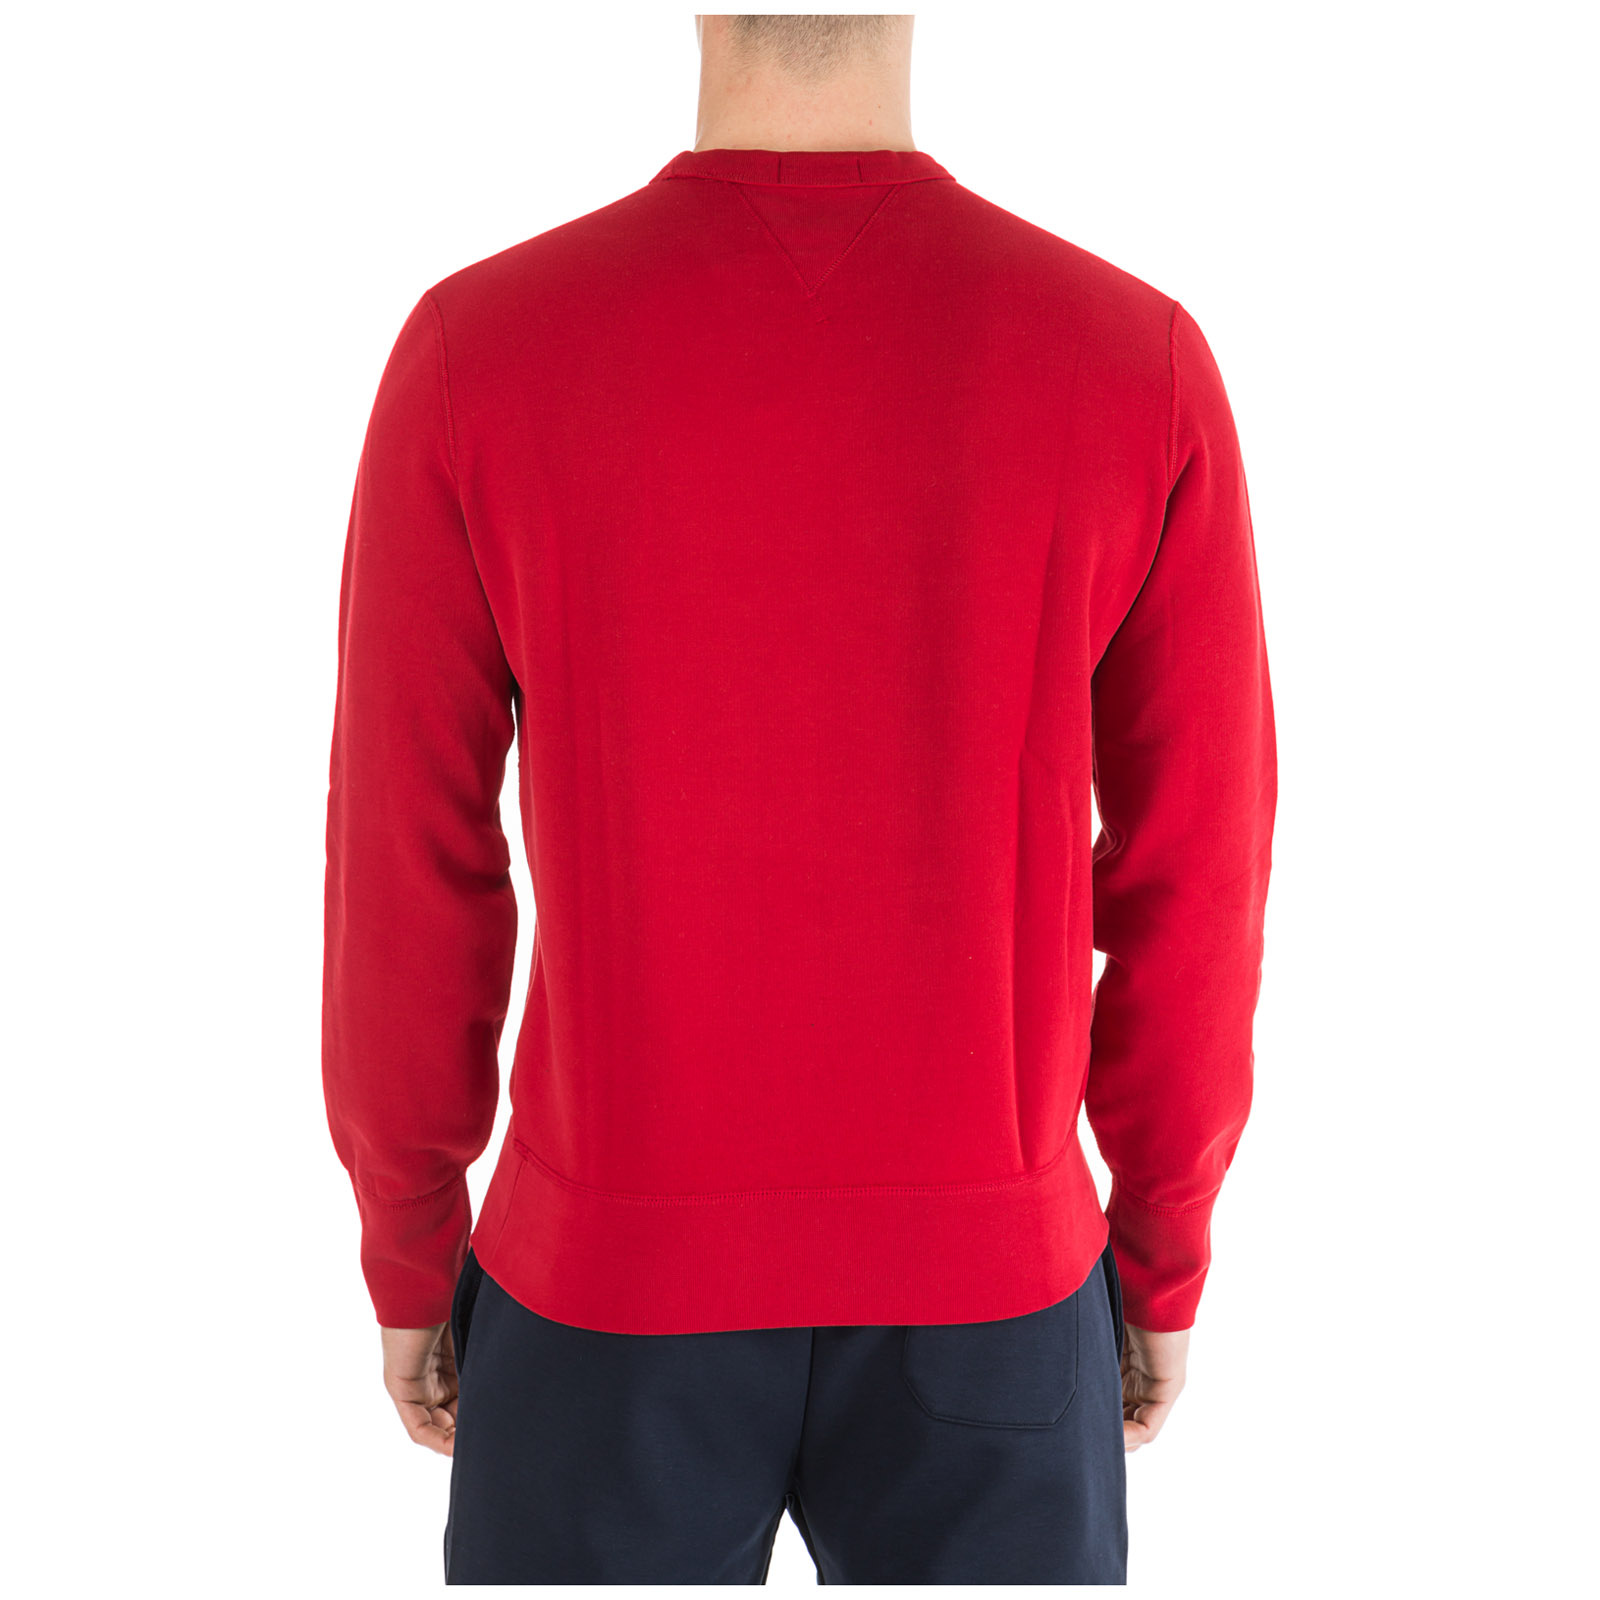 newest 0310b 0a111 Herren sweatshirt